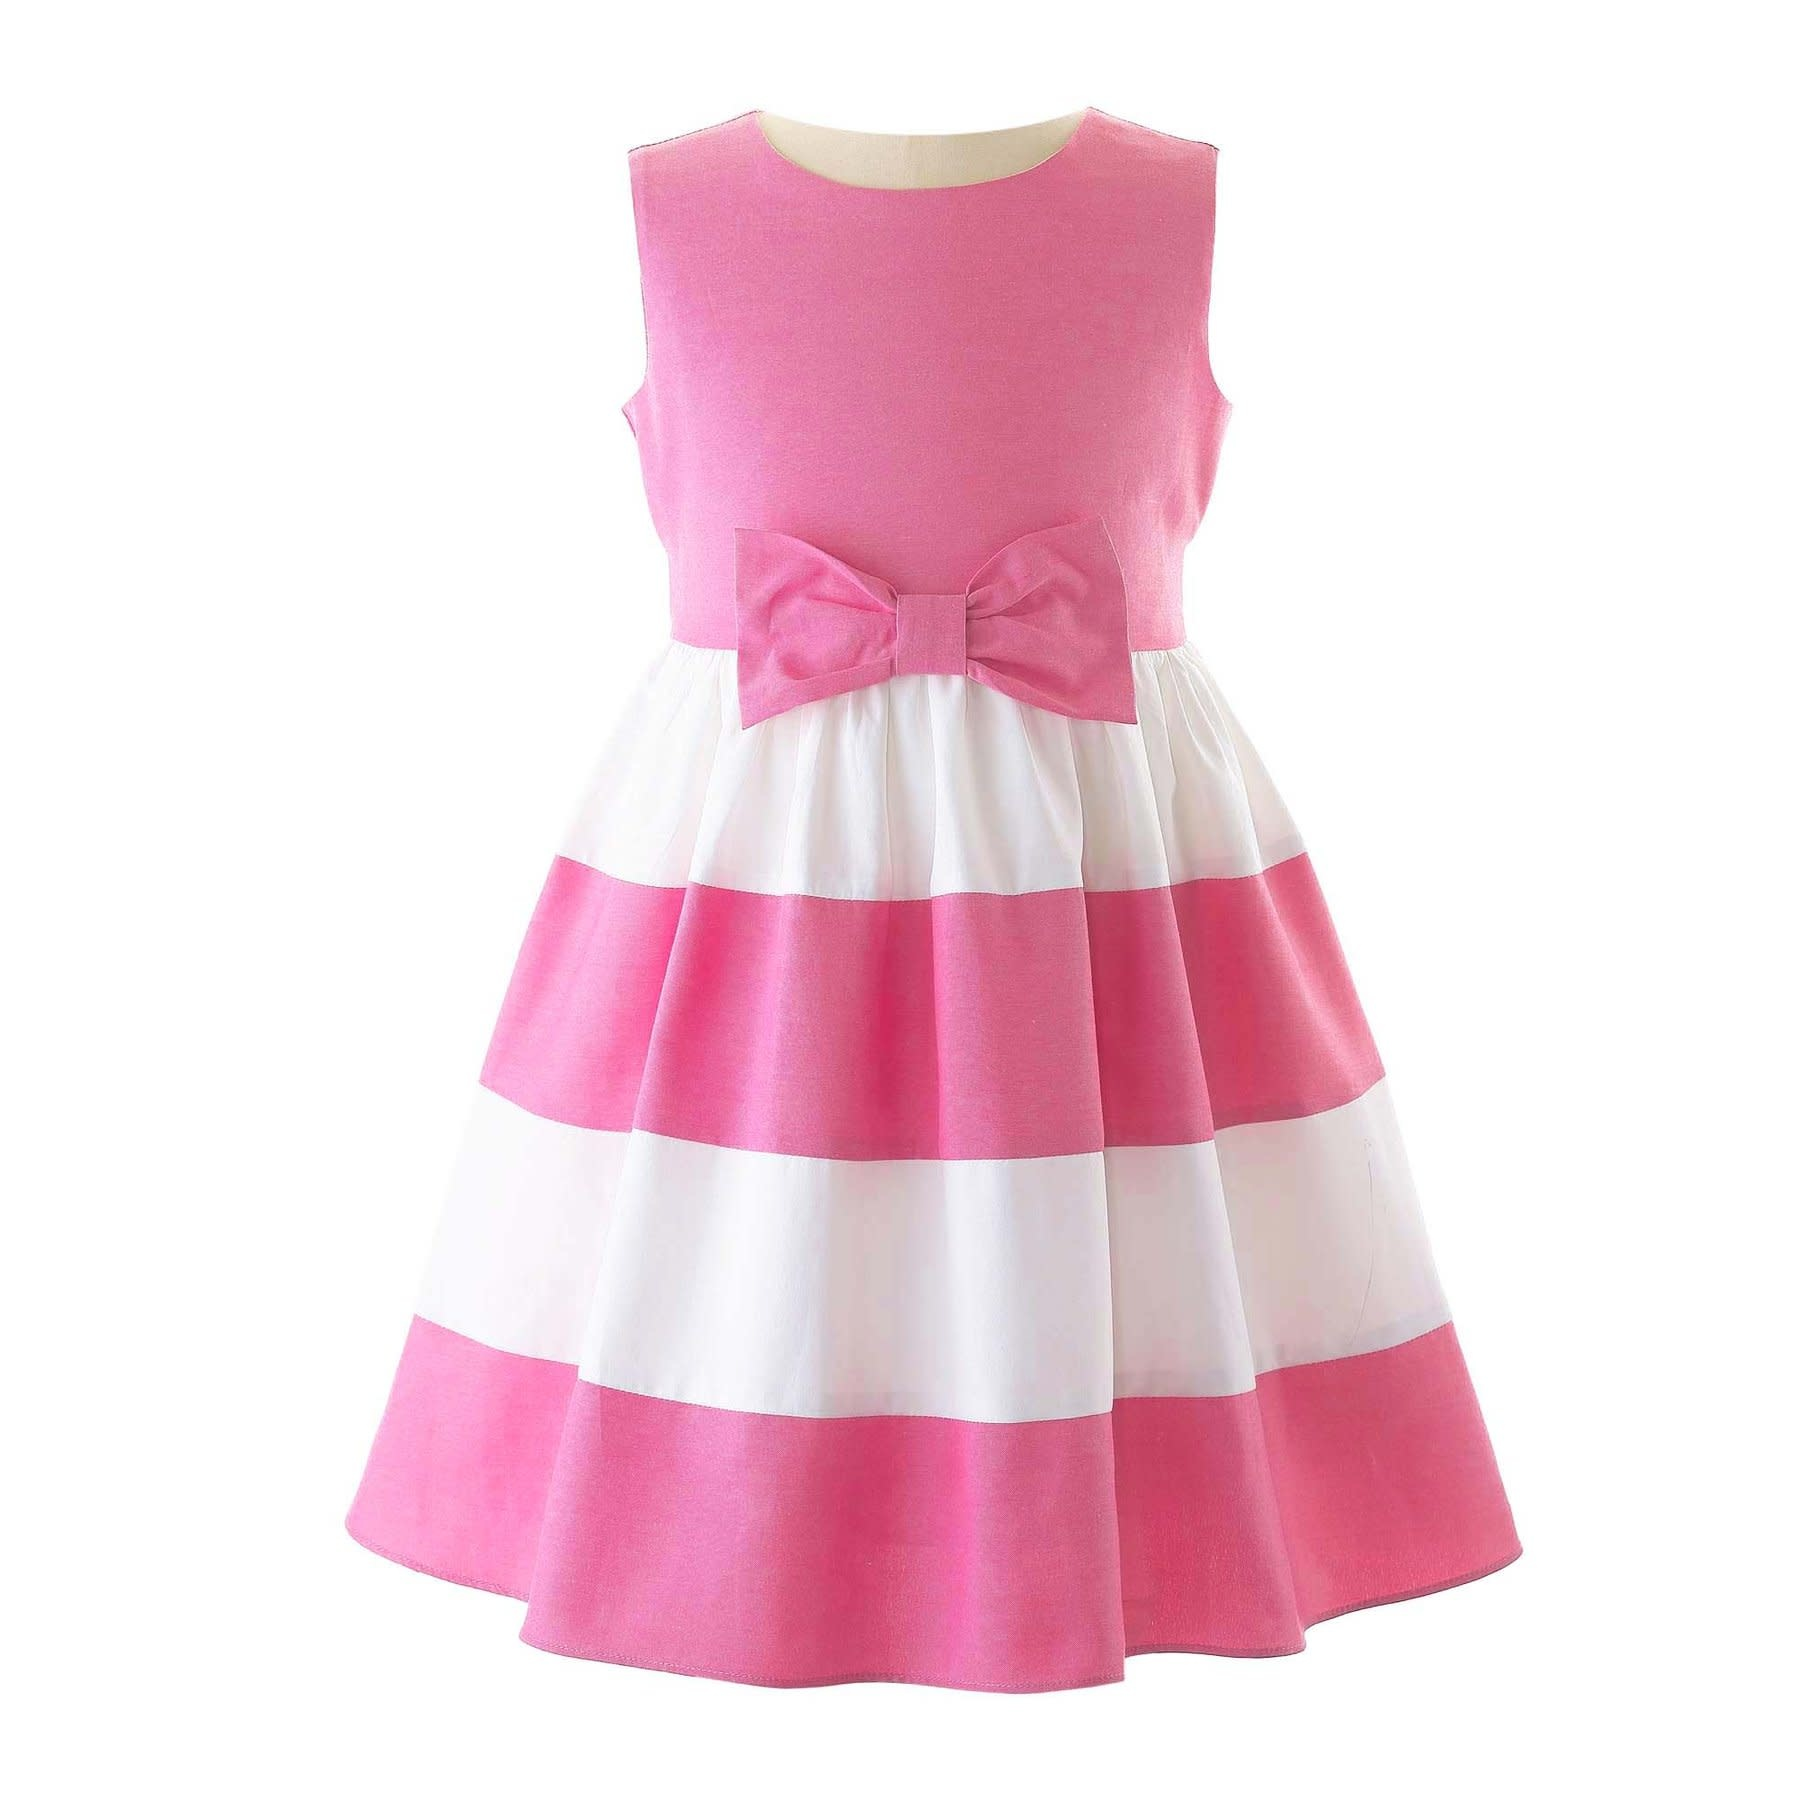 Rachel Riley Pink Chambray Panel Dress